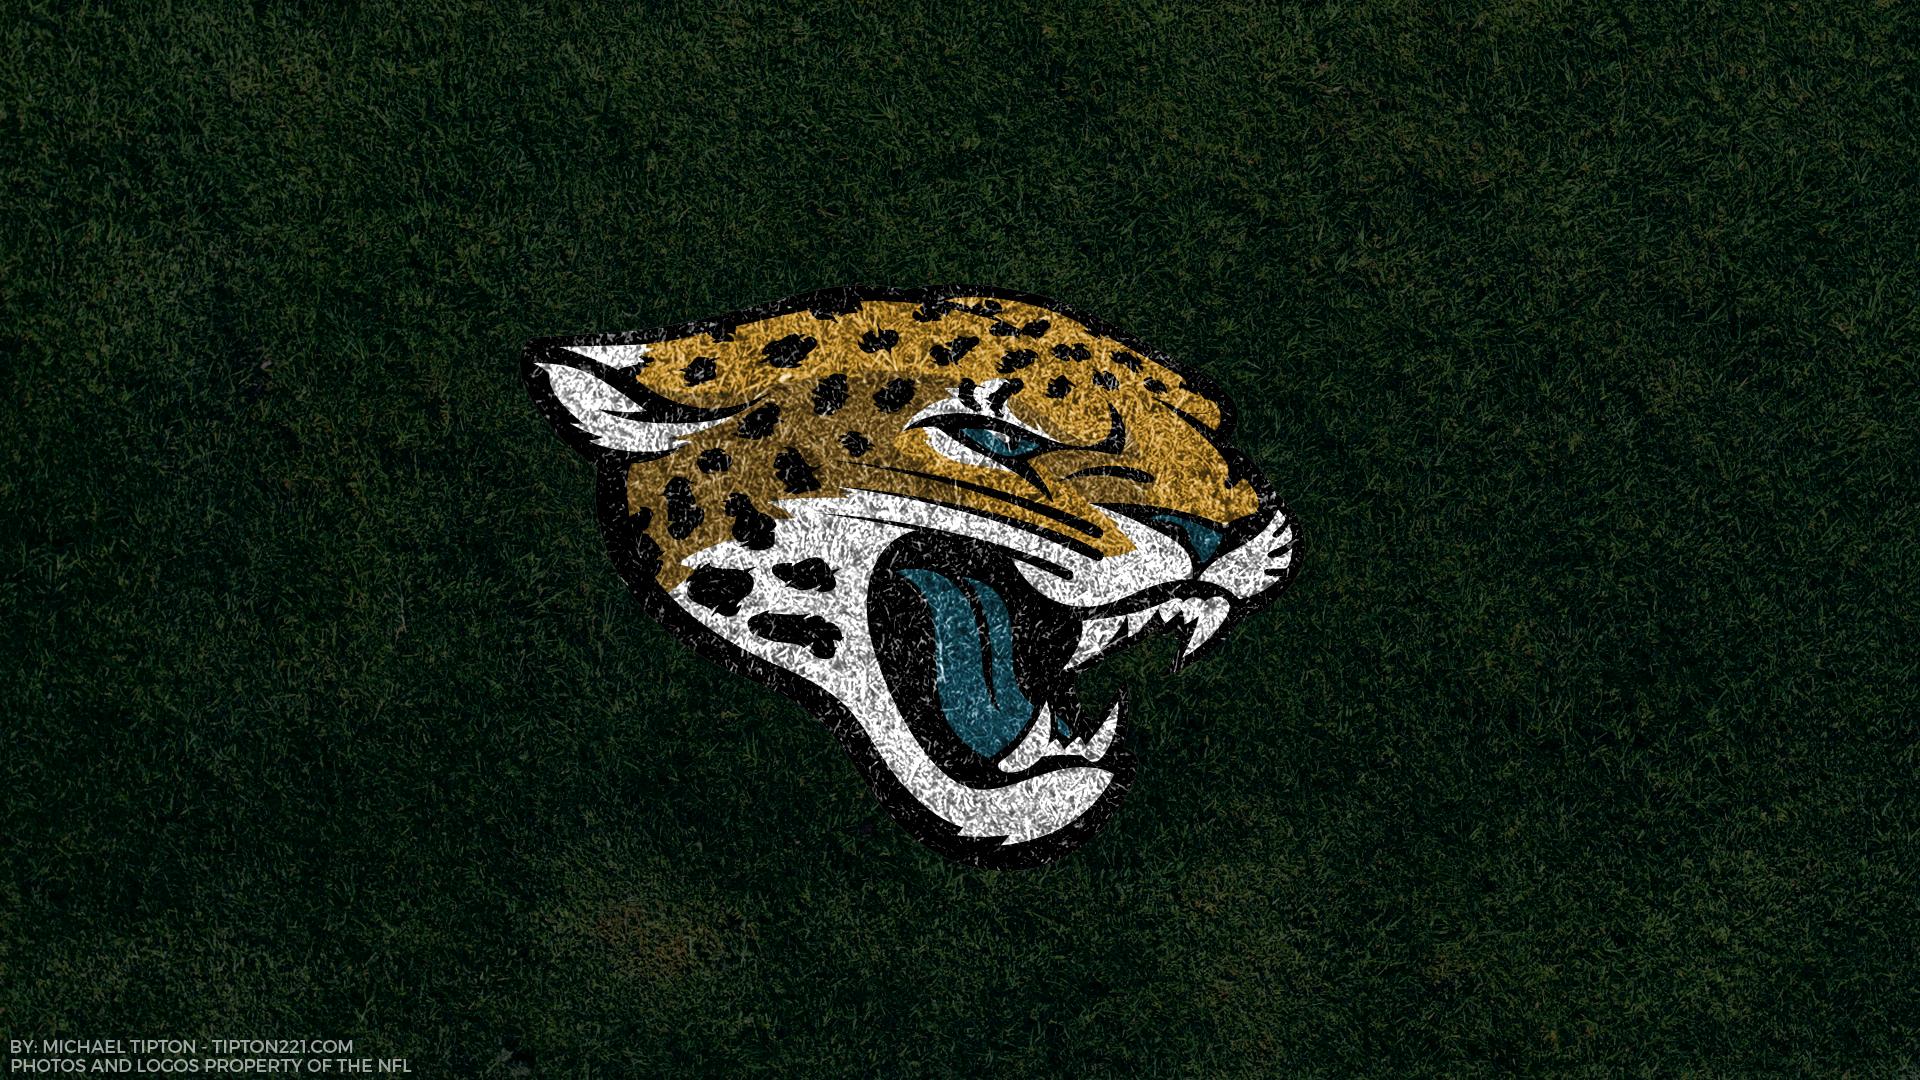 Jacksonville Jaguars Hd Wallpaper Hintergrund 1920x1080 Id 981450 Wallpaper Abyss